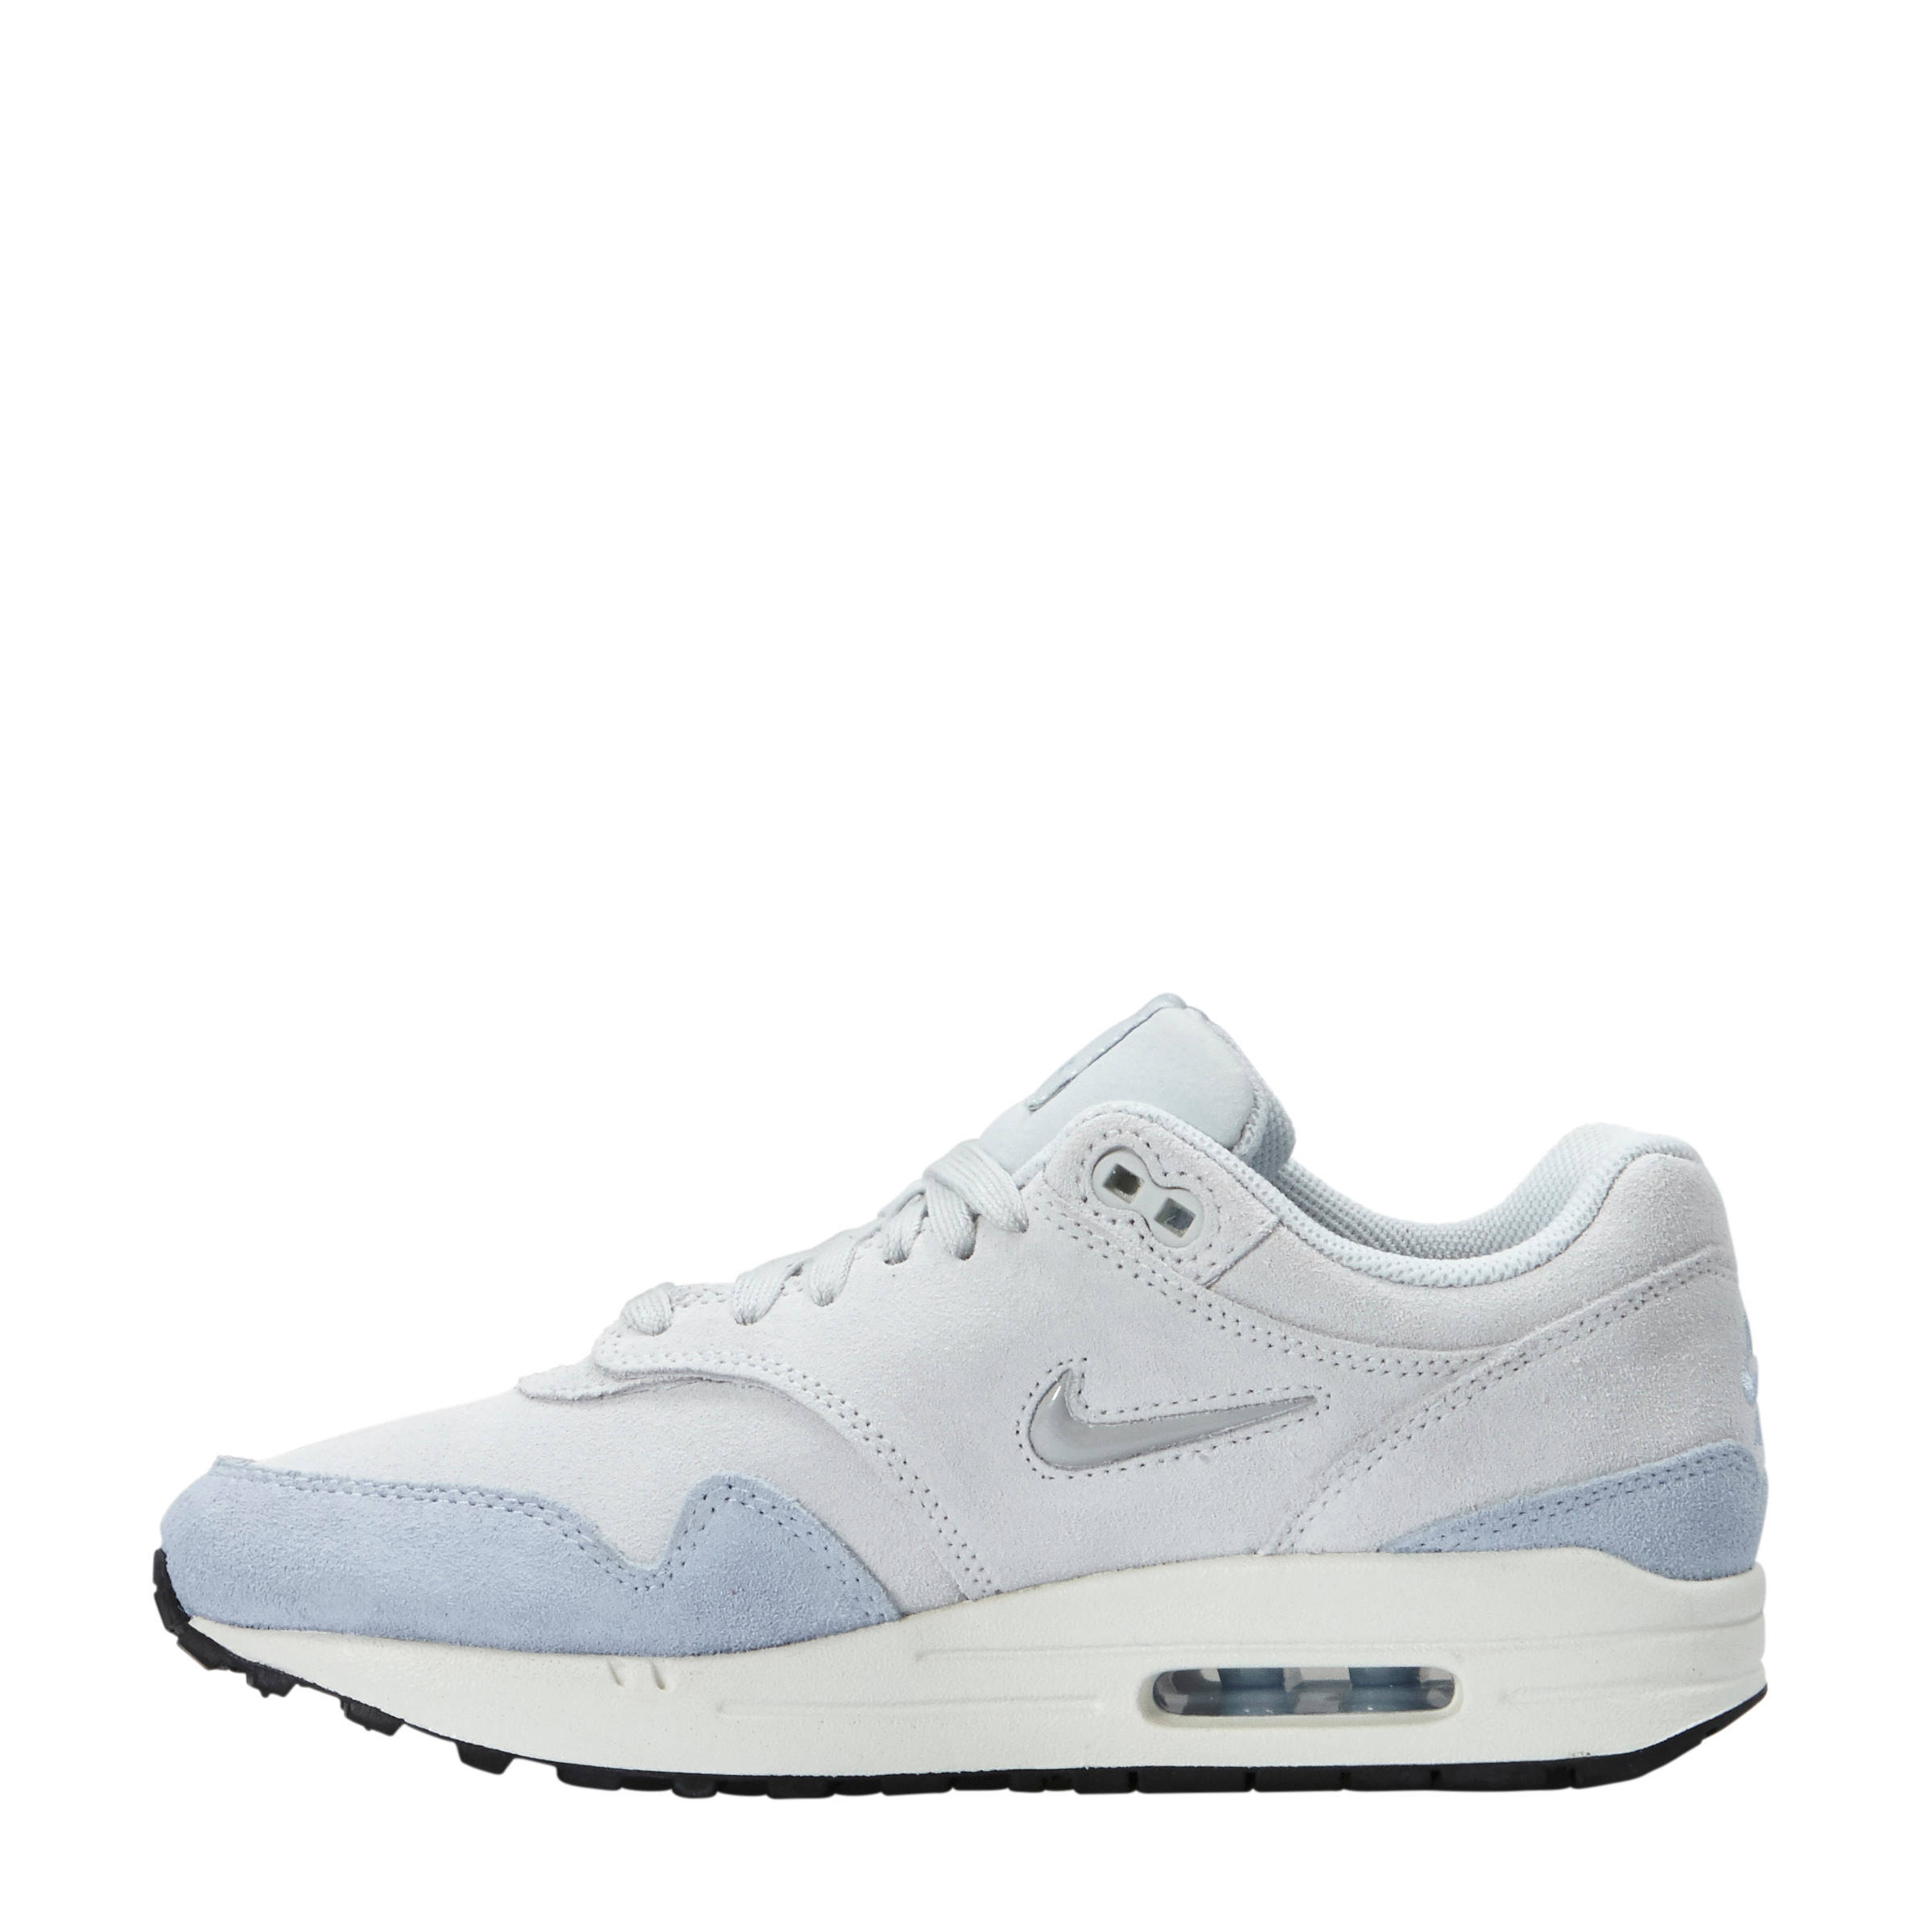 8fe7c5a2f nike -air-max-1-premium-sneakers-gebroken-wit-lichtblauw-ecru-0887223877998.jpg